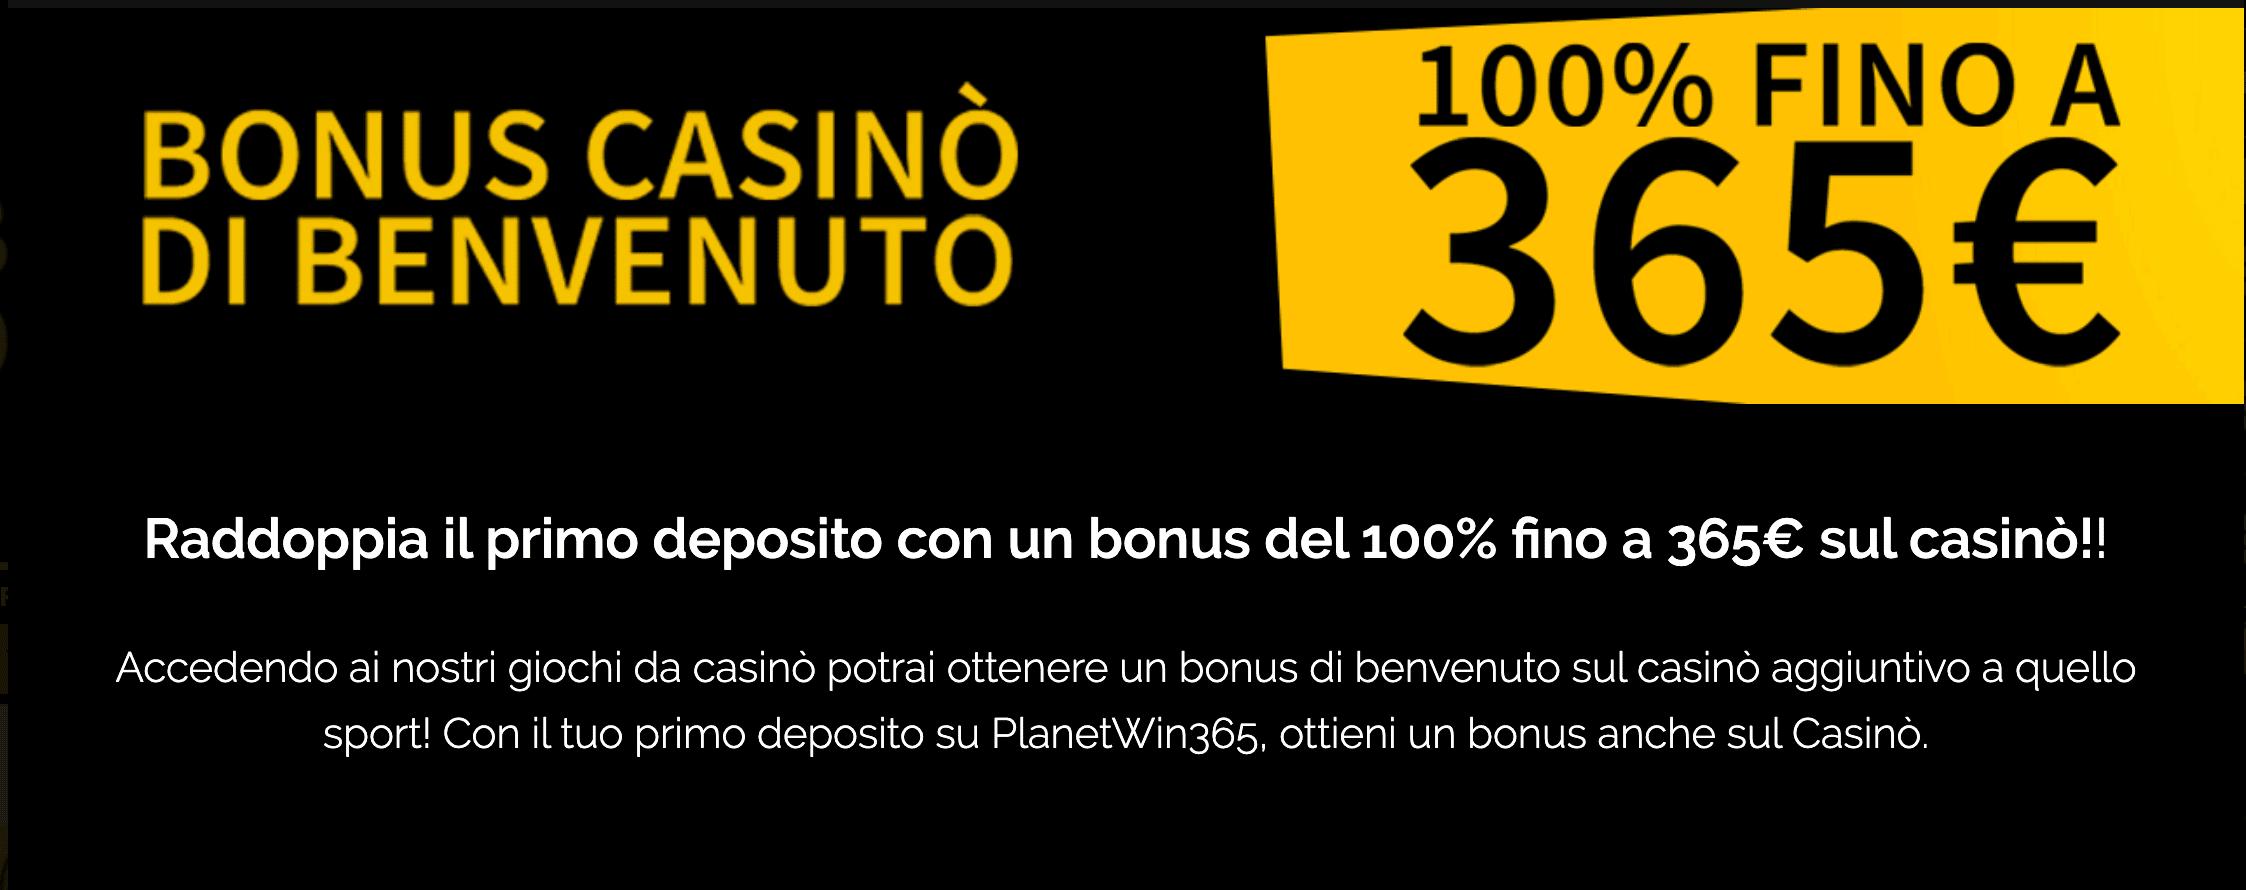 Planetwin365 Casino Bonus Benvenuto